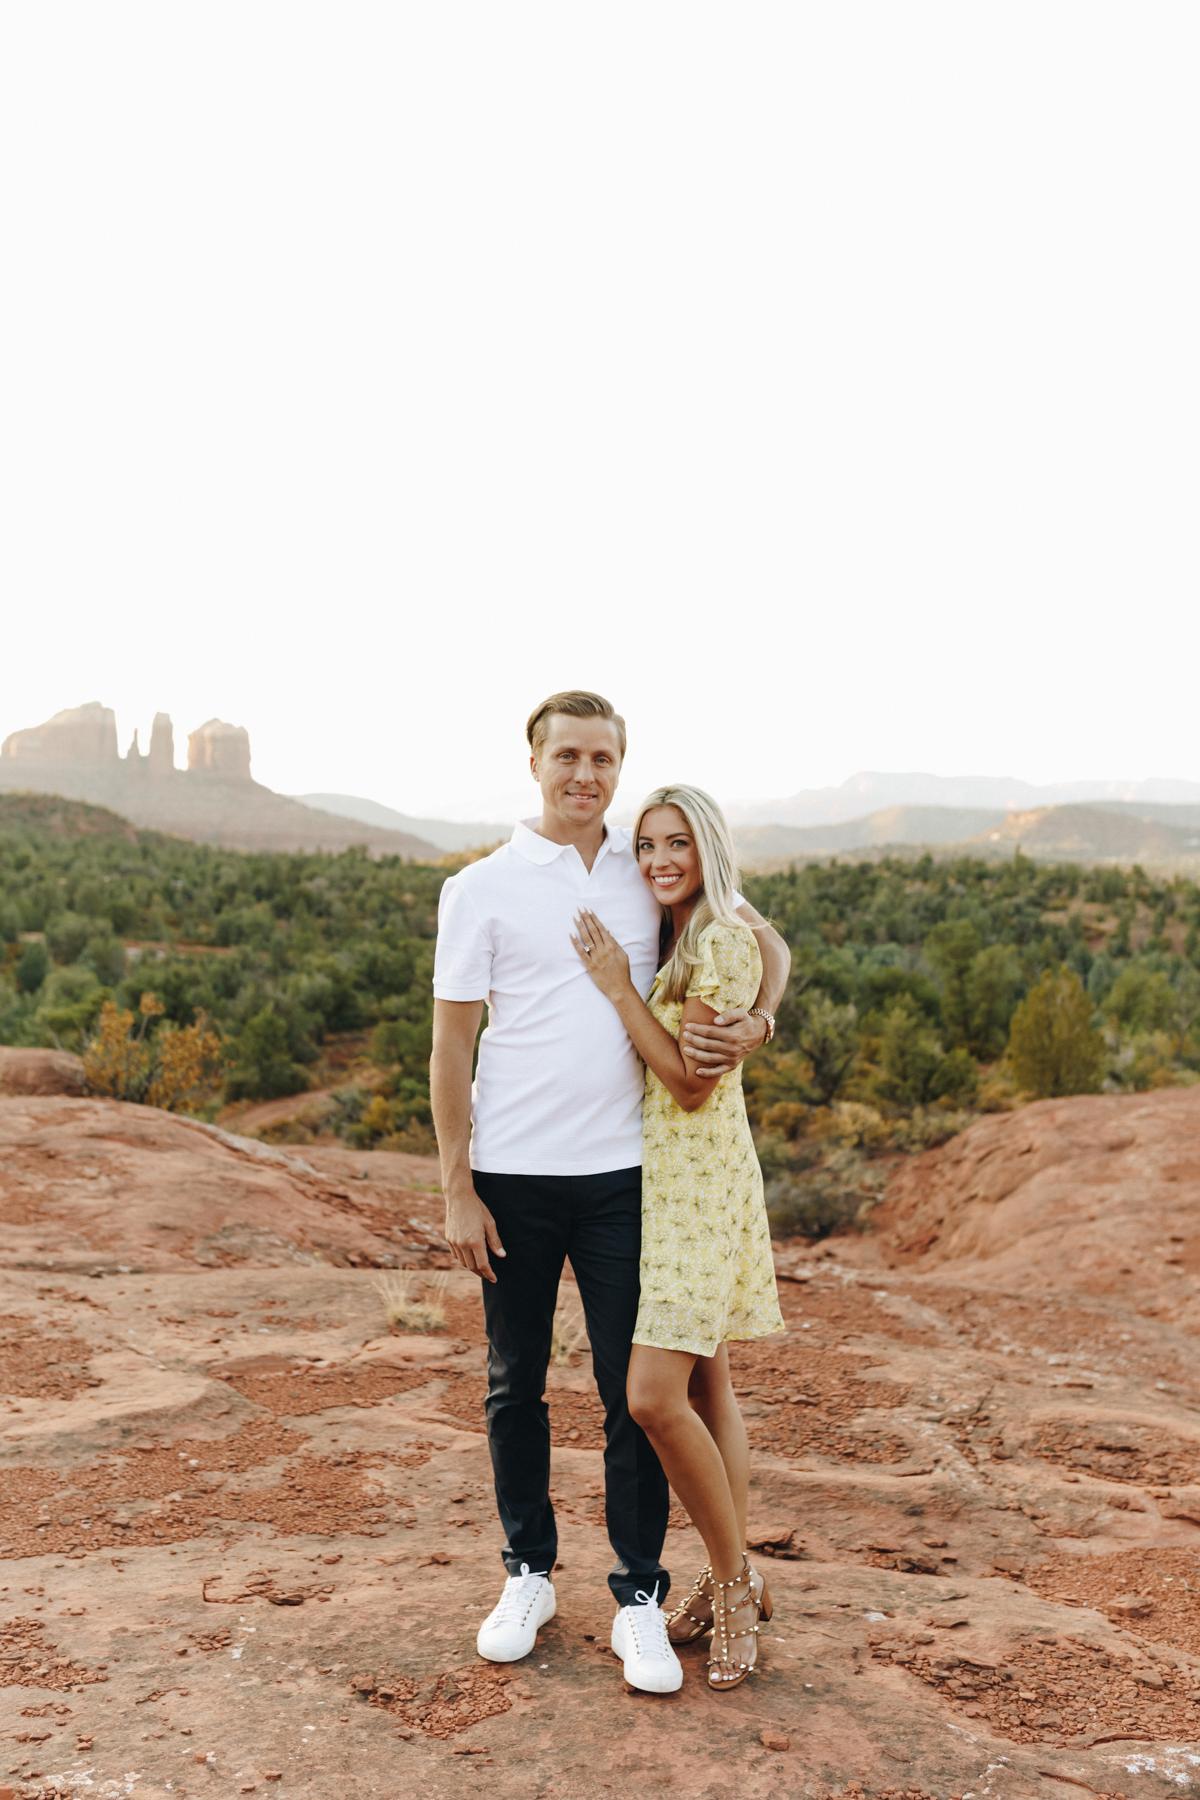 Megan Claire Photography   Adventurous Sedona Arizona Engagement Session